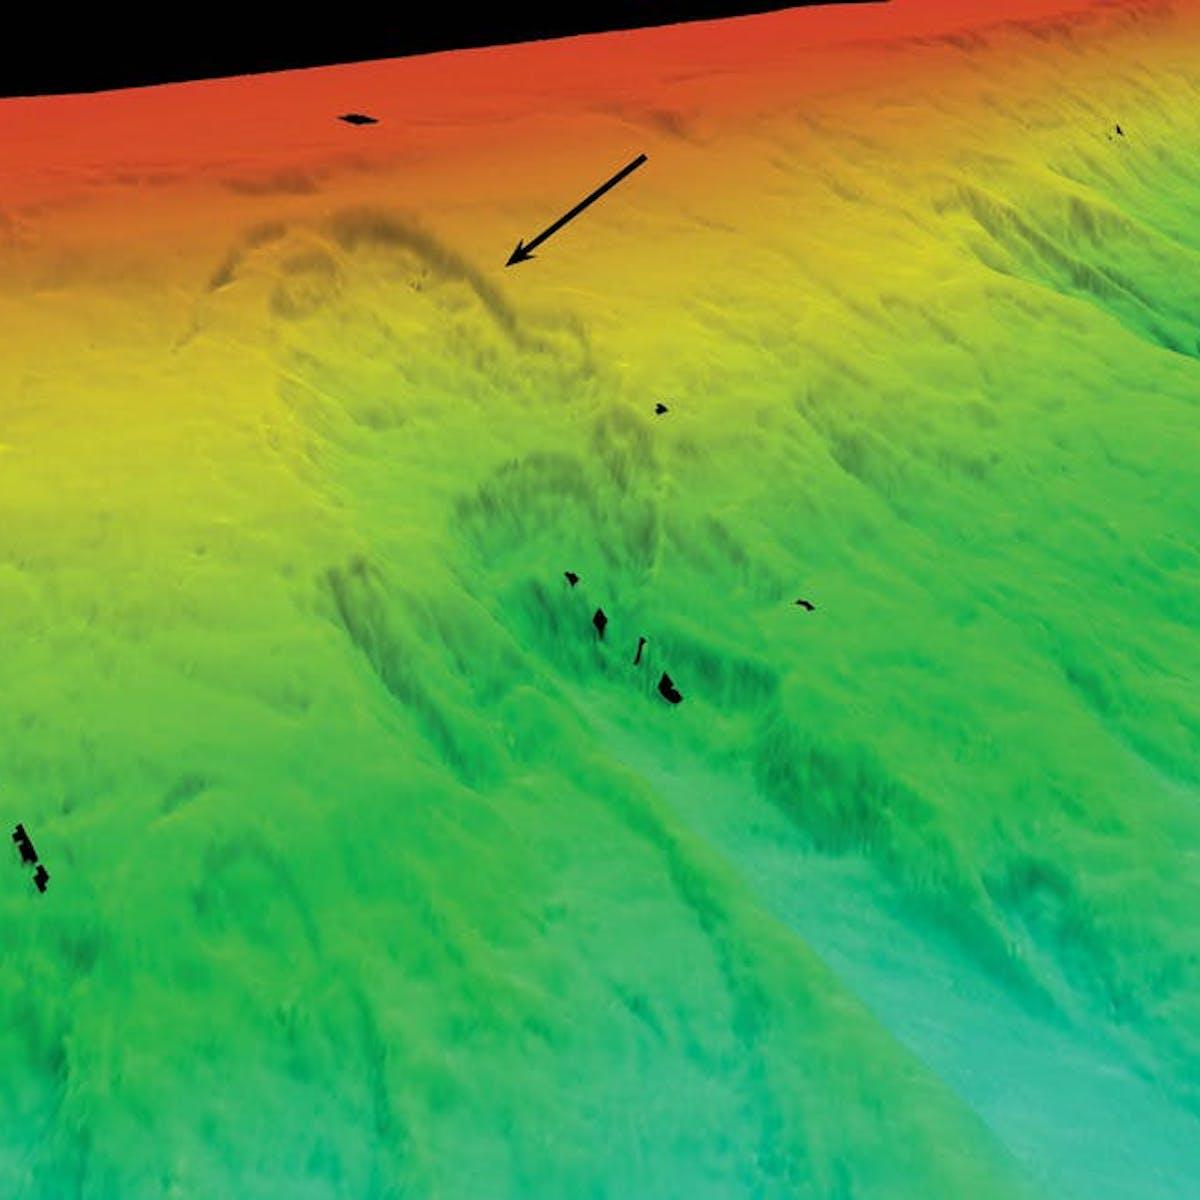 Scars left by Australia's undersea landslides reveal future